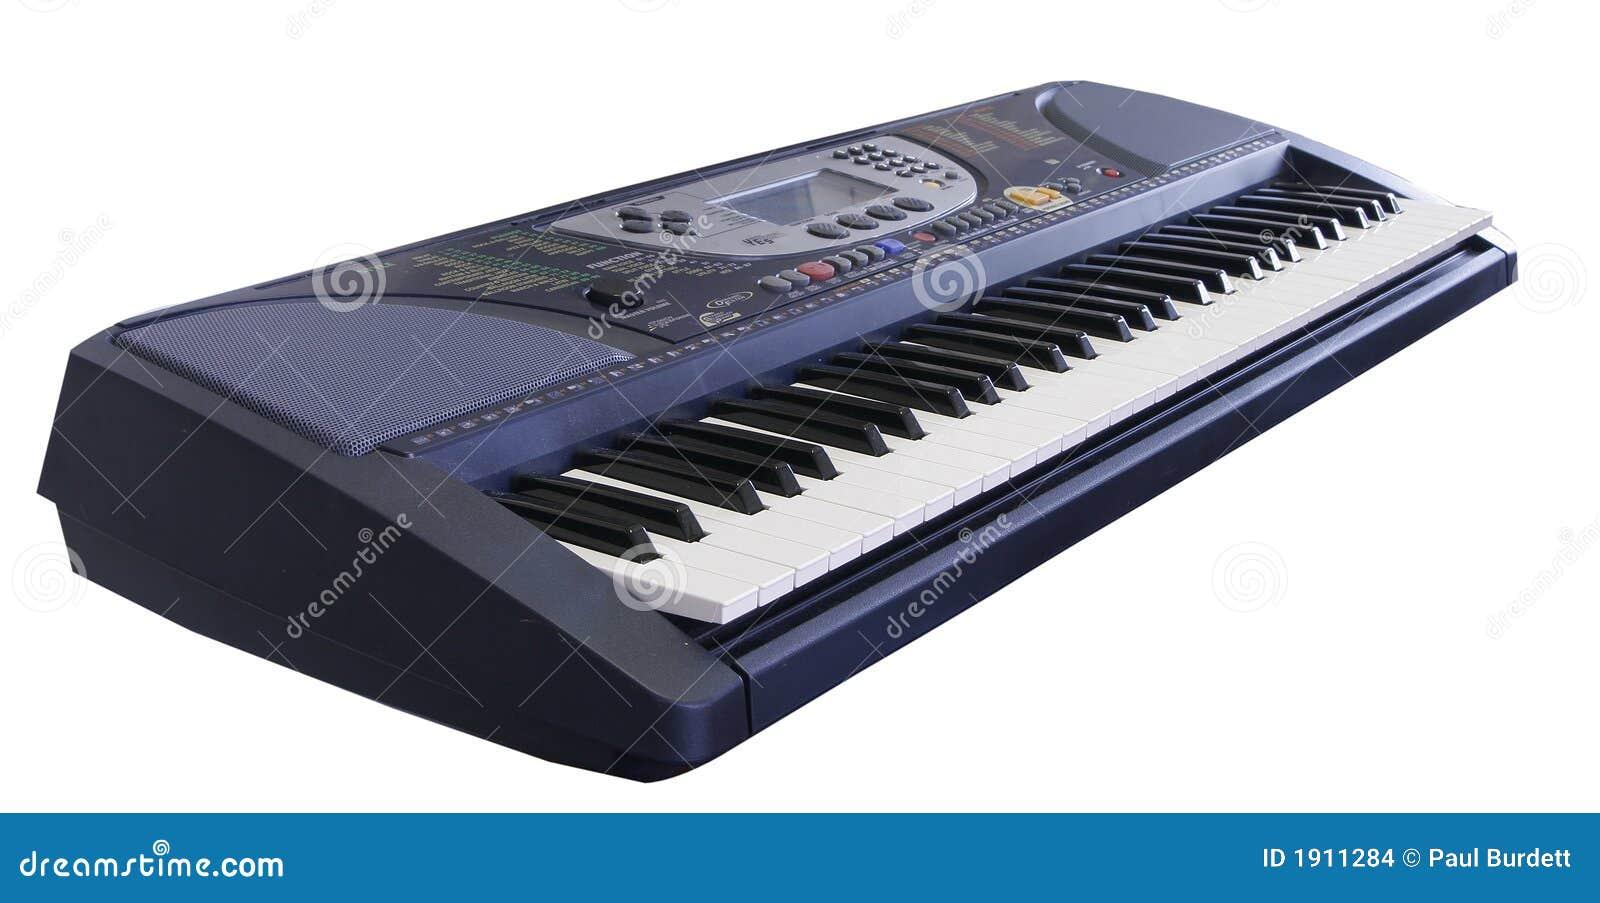 music keyboards laptops recording - photo #33